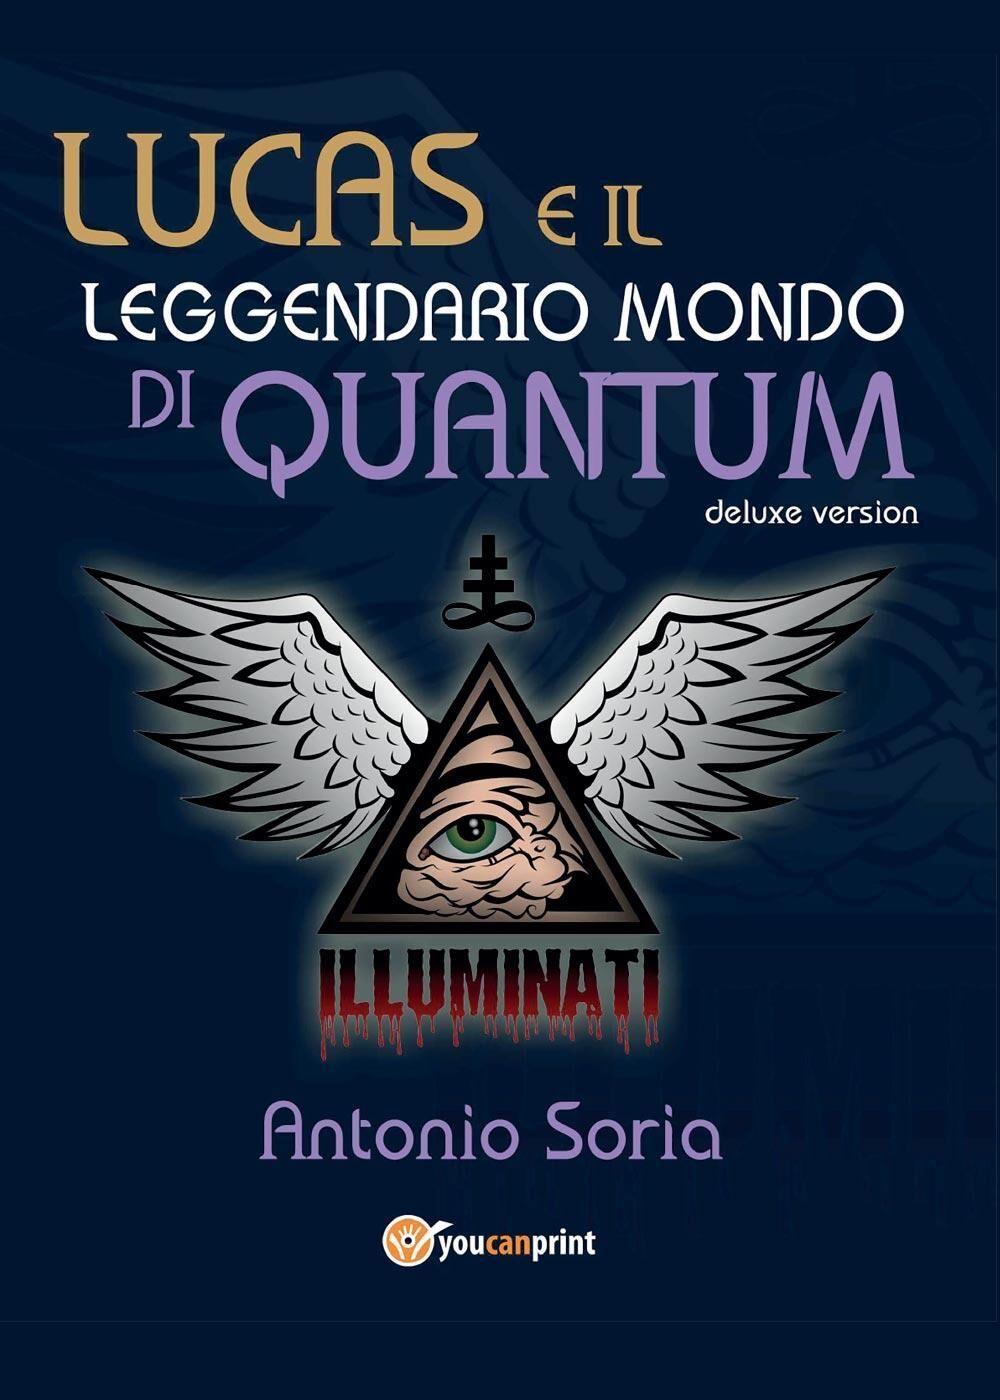 Lucas e il leggendario mondo di Quantum. Deluxe version. Premium edition